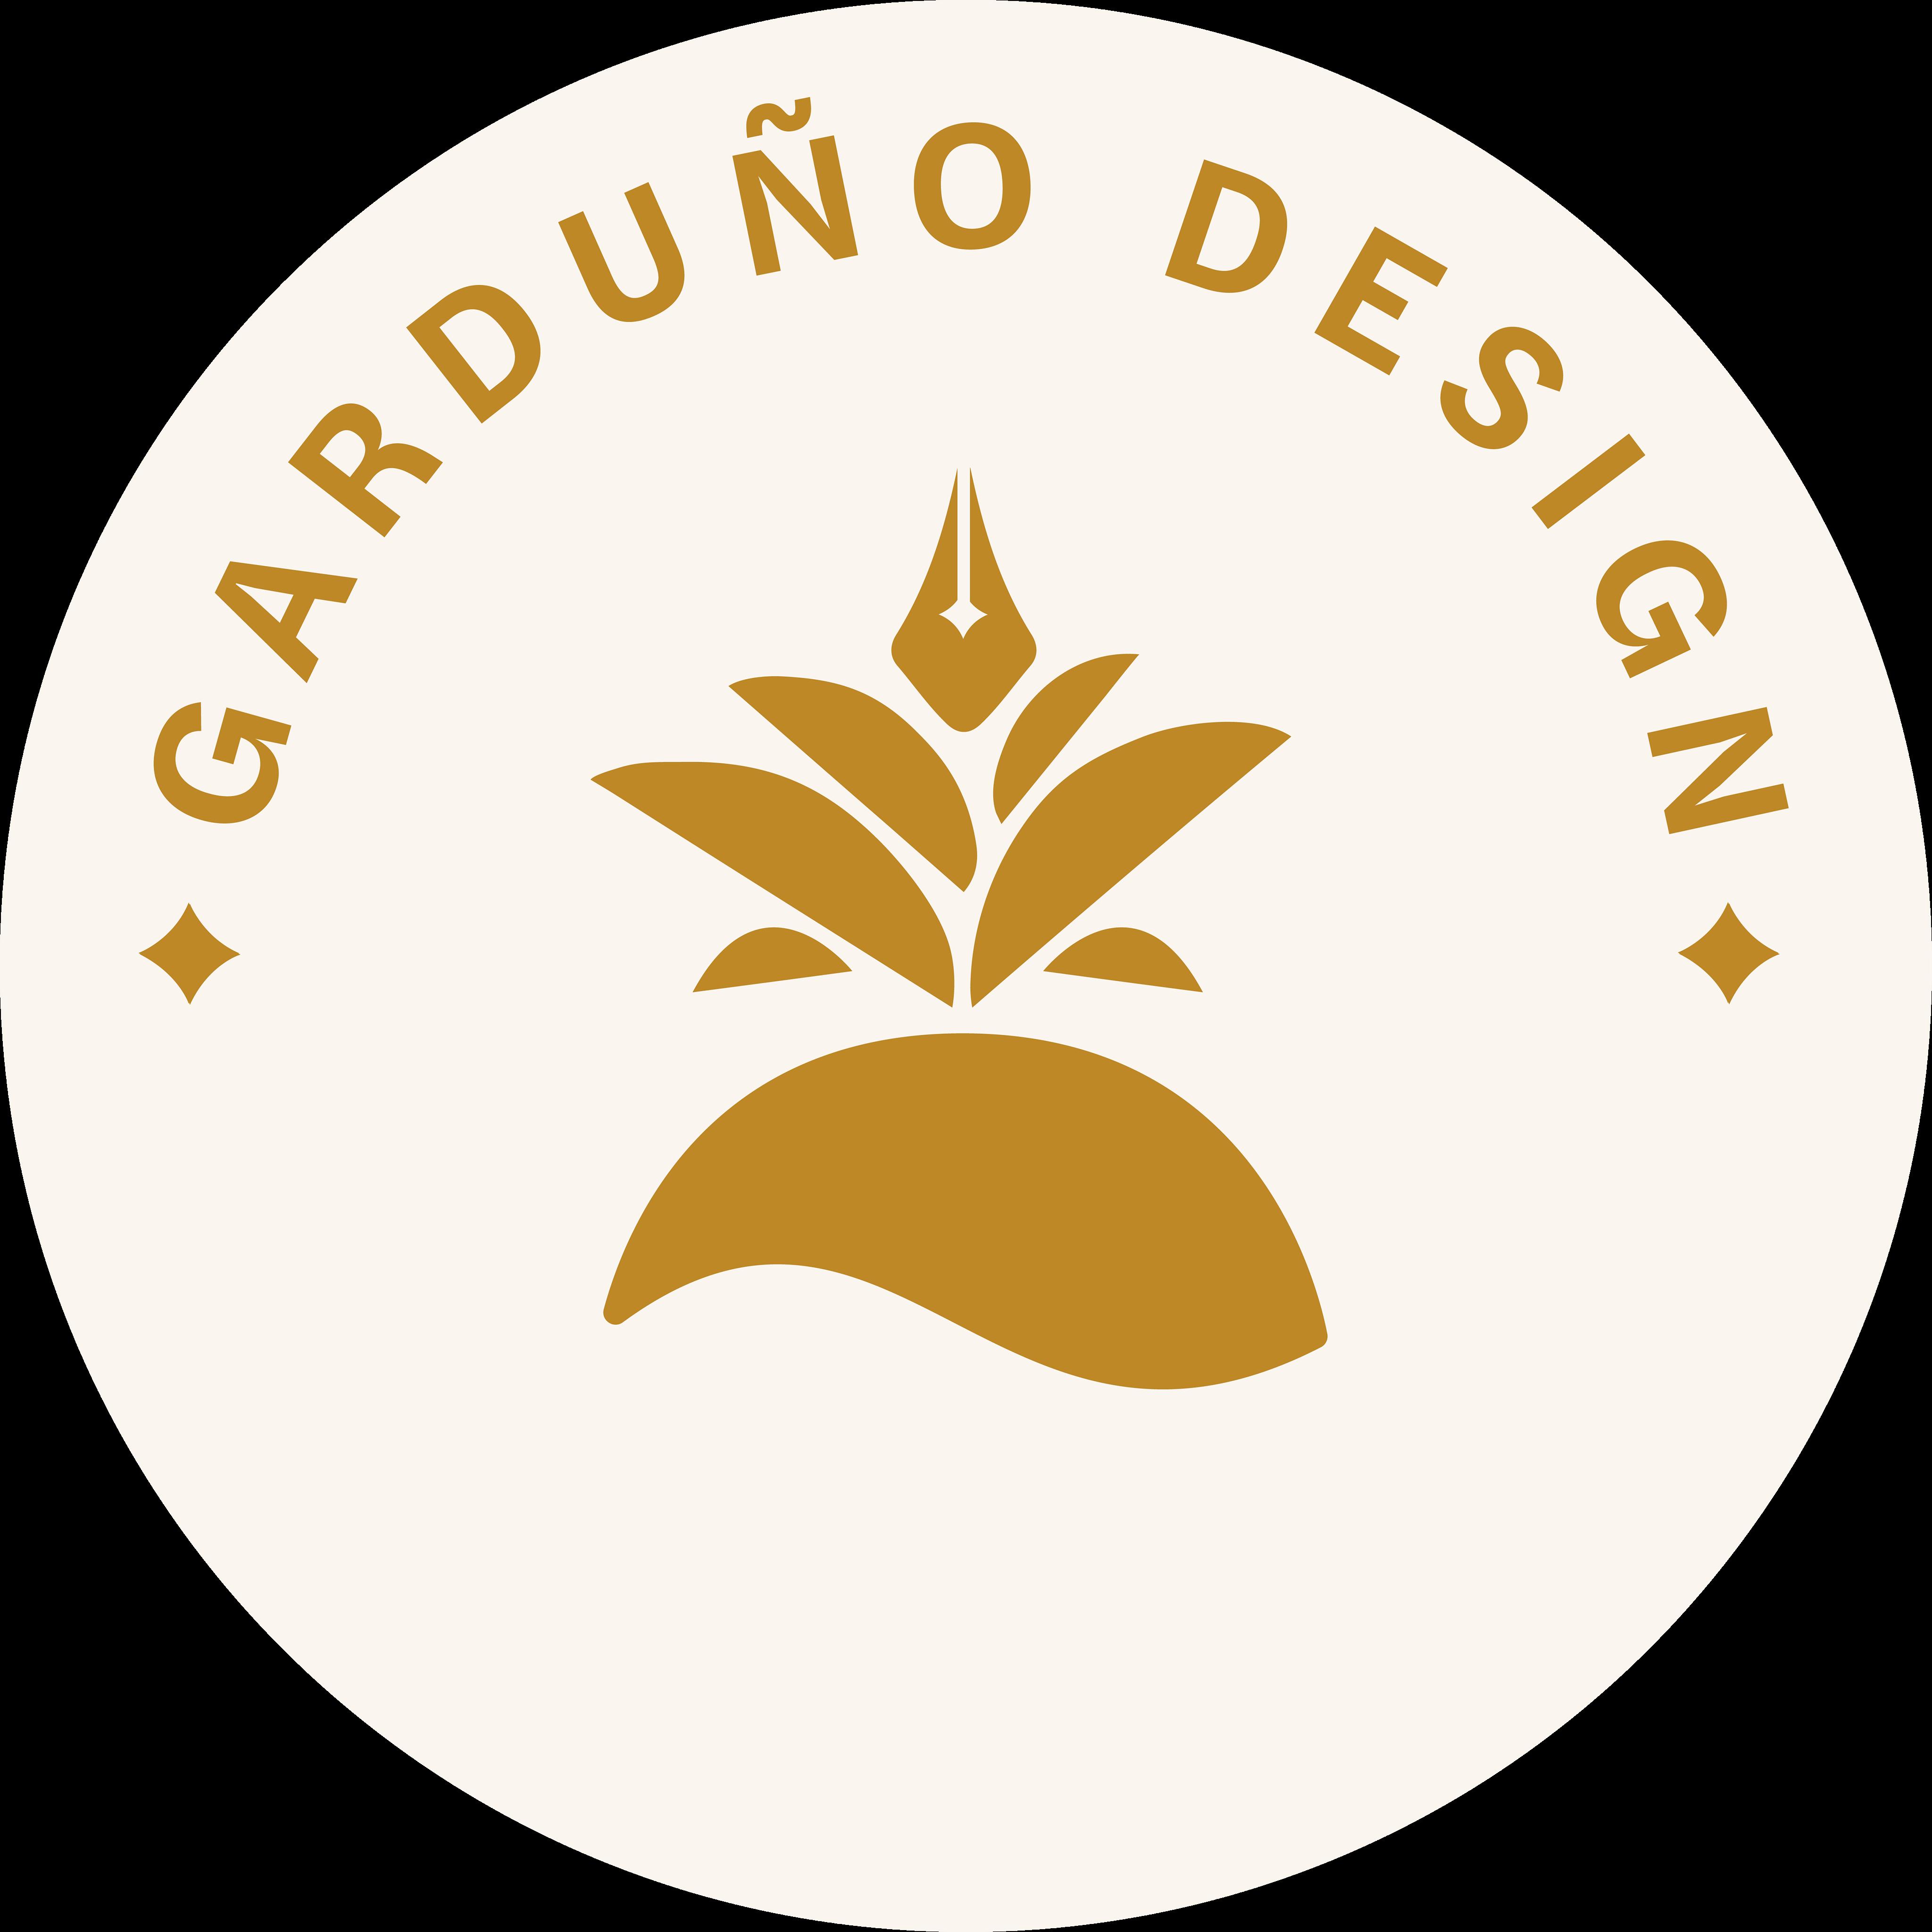 Garduño Design